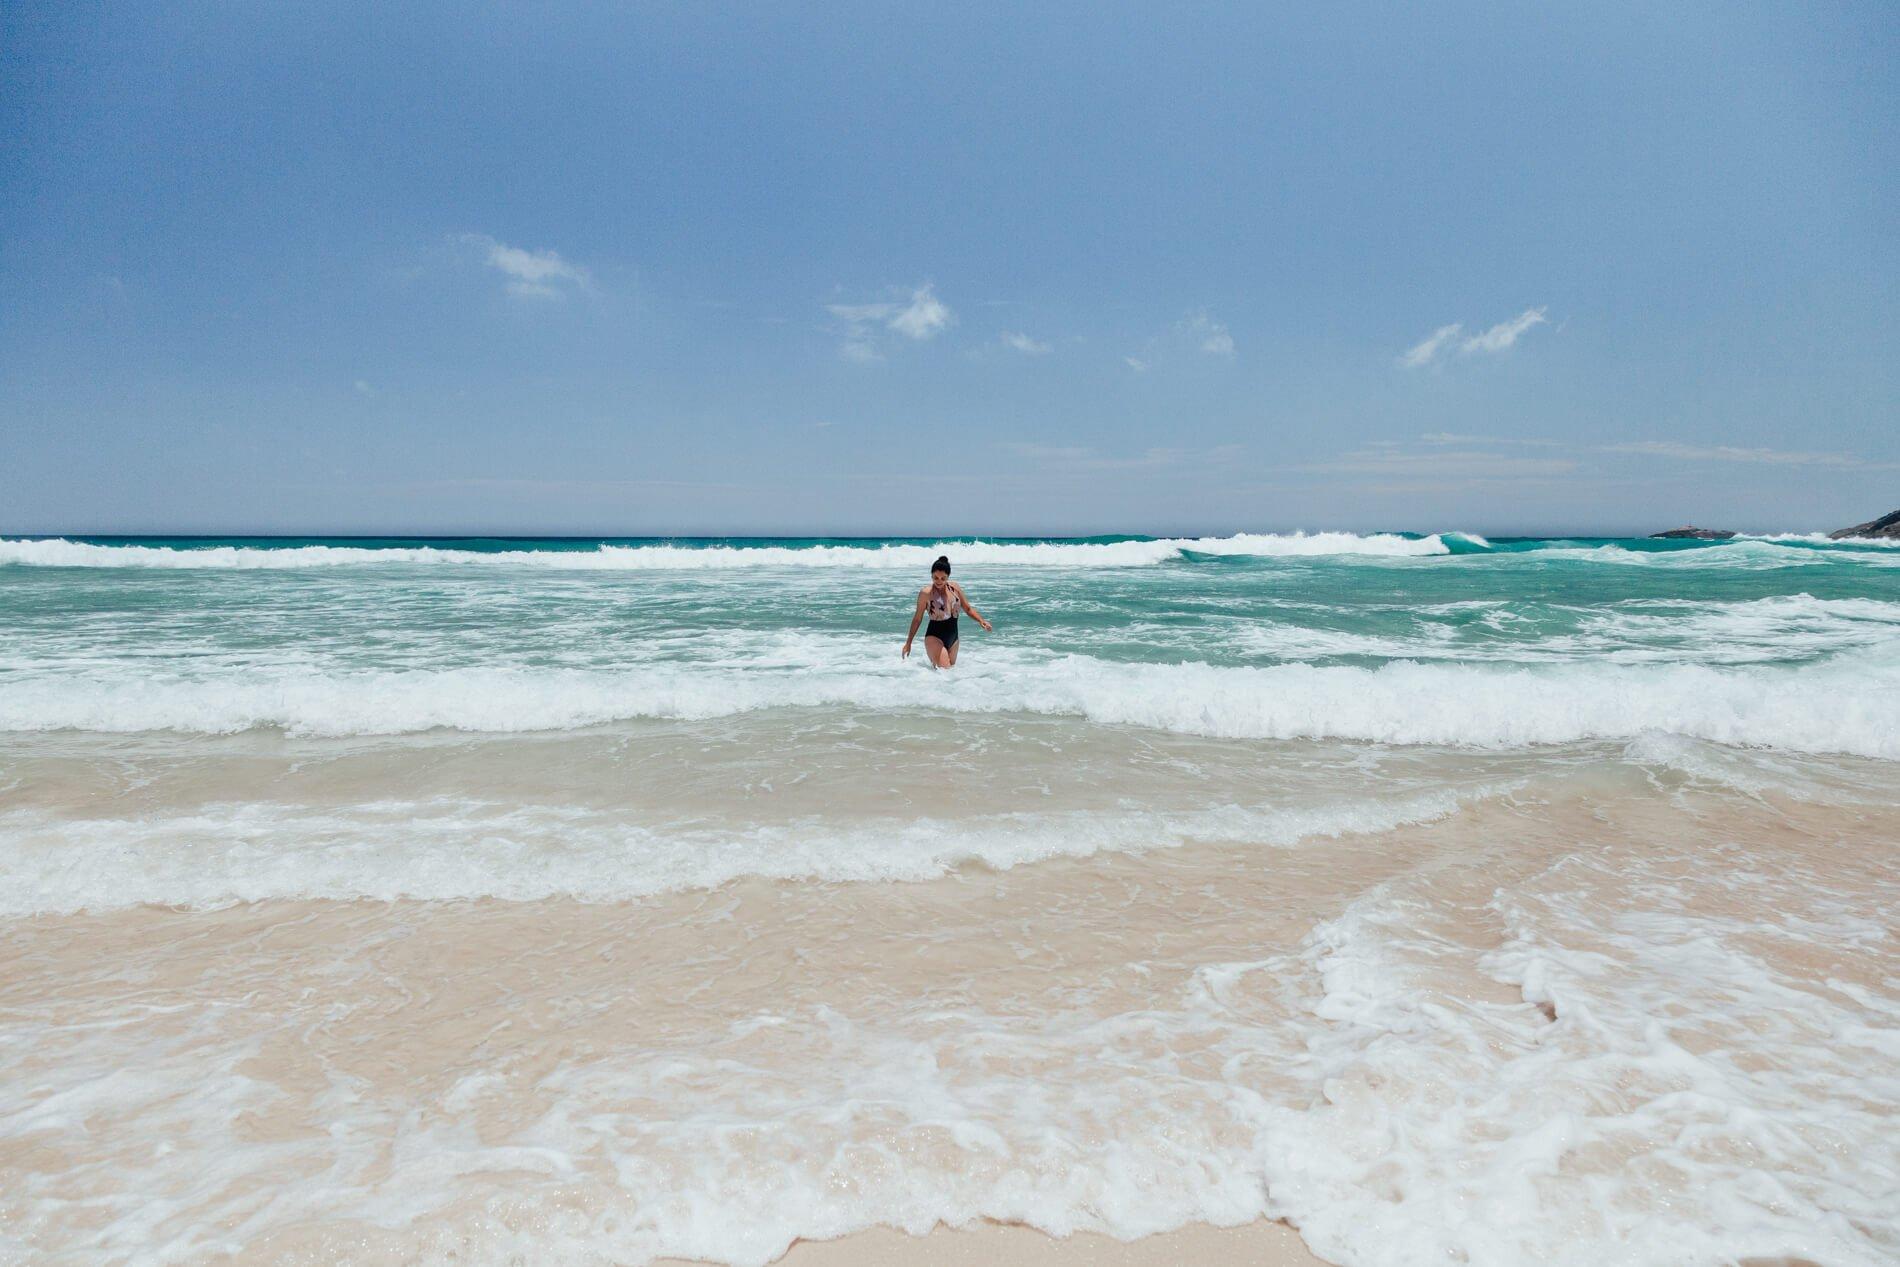 Mar e céu azul na Praia Brava, Arraial do Cabo